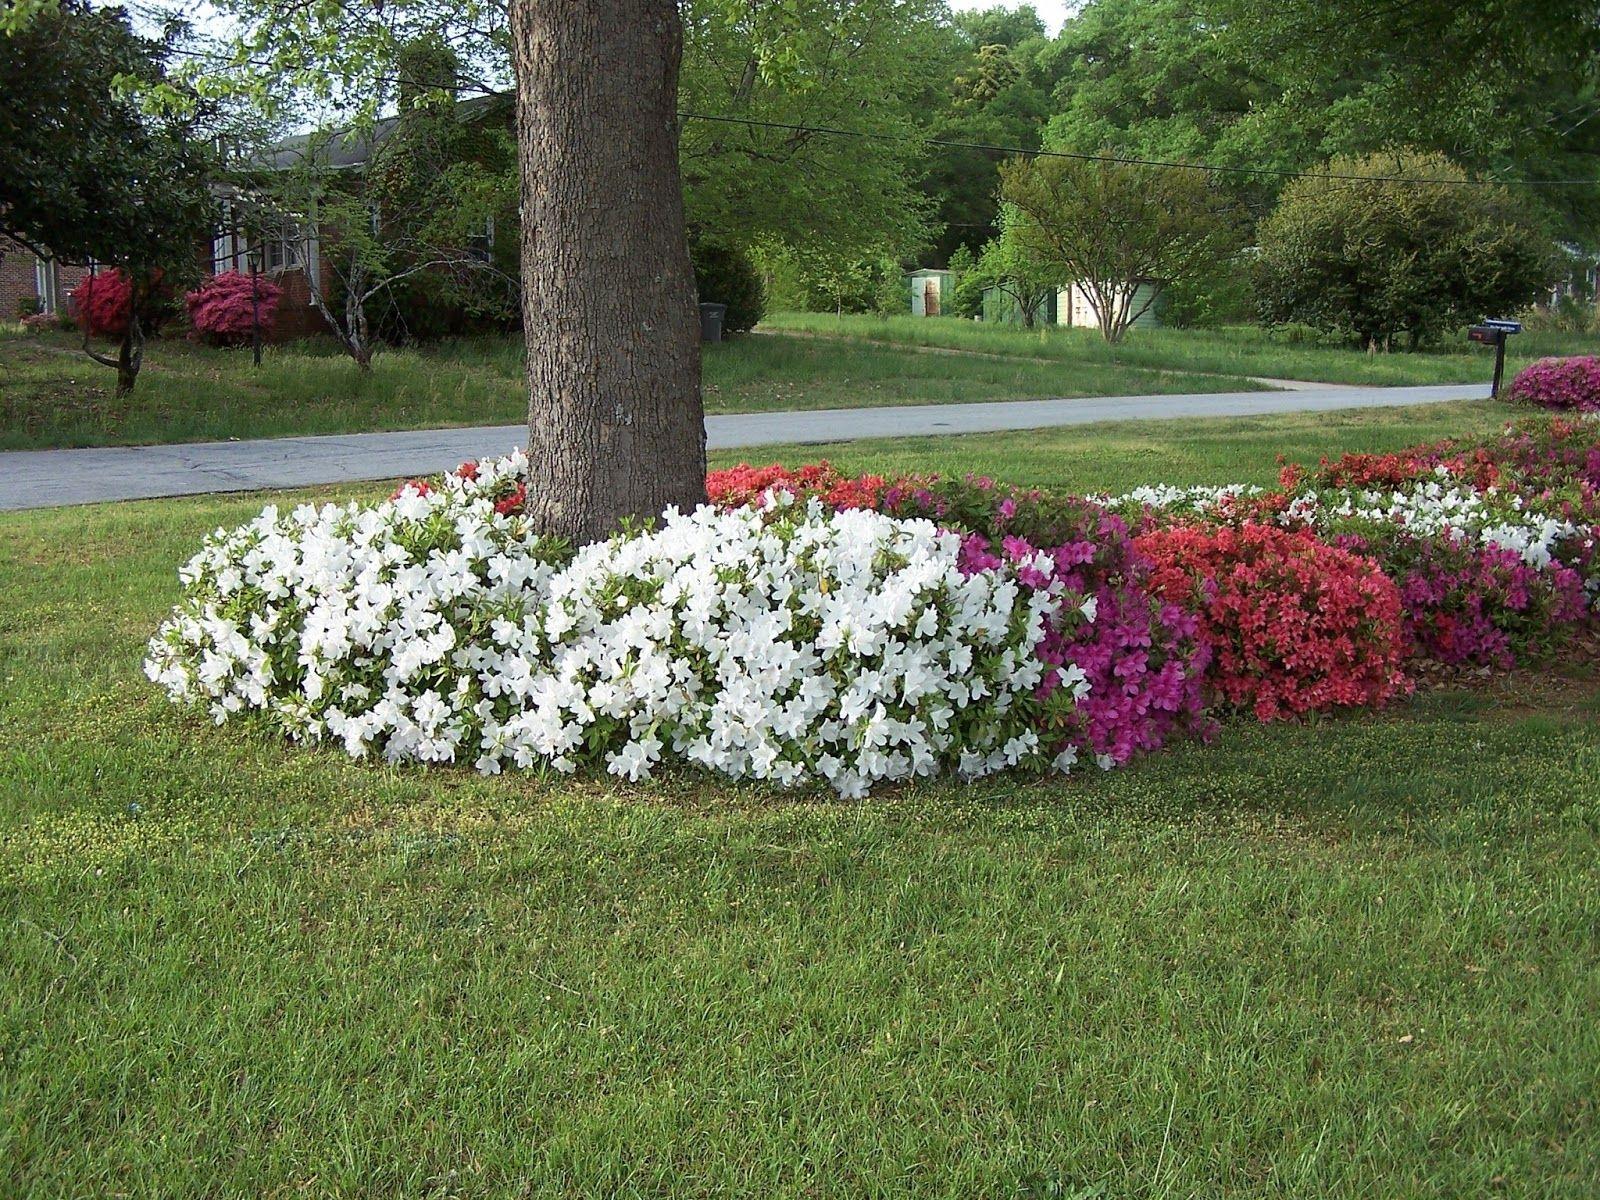 flowers in base of trees-flowers